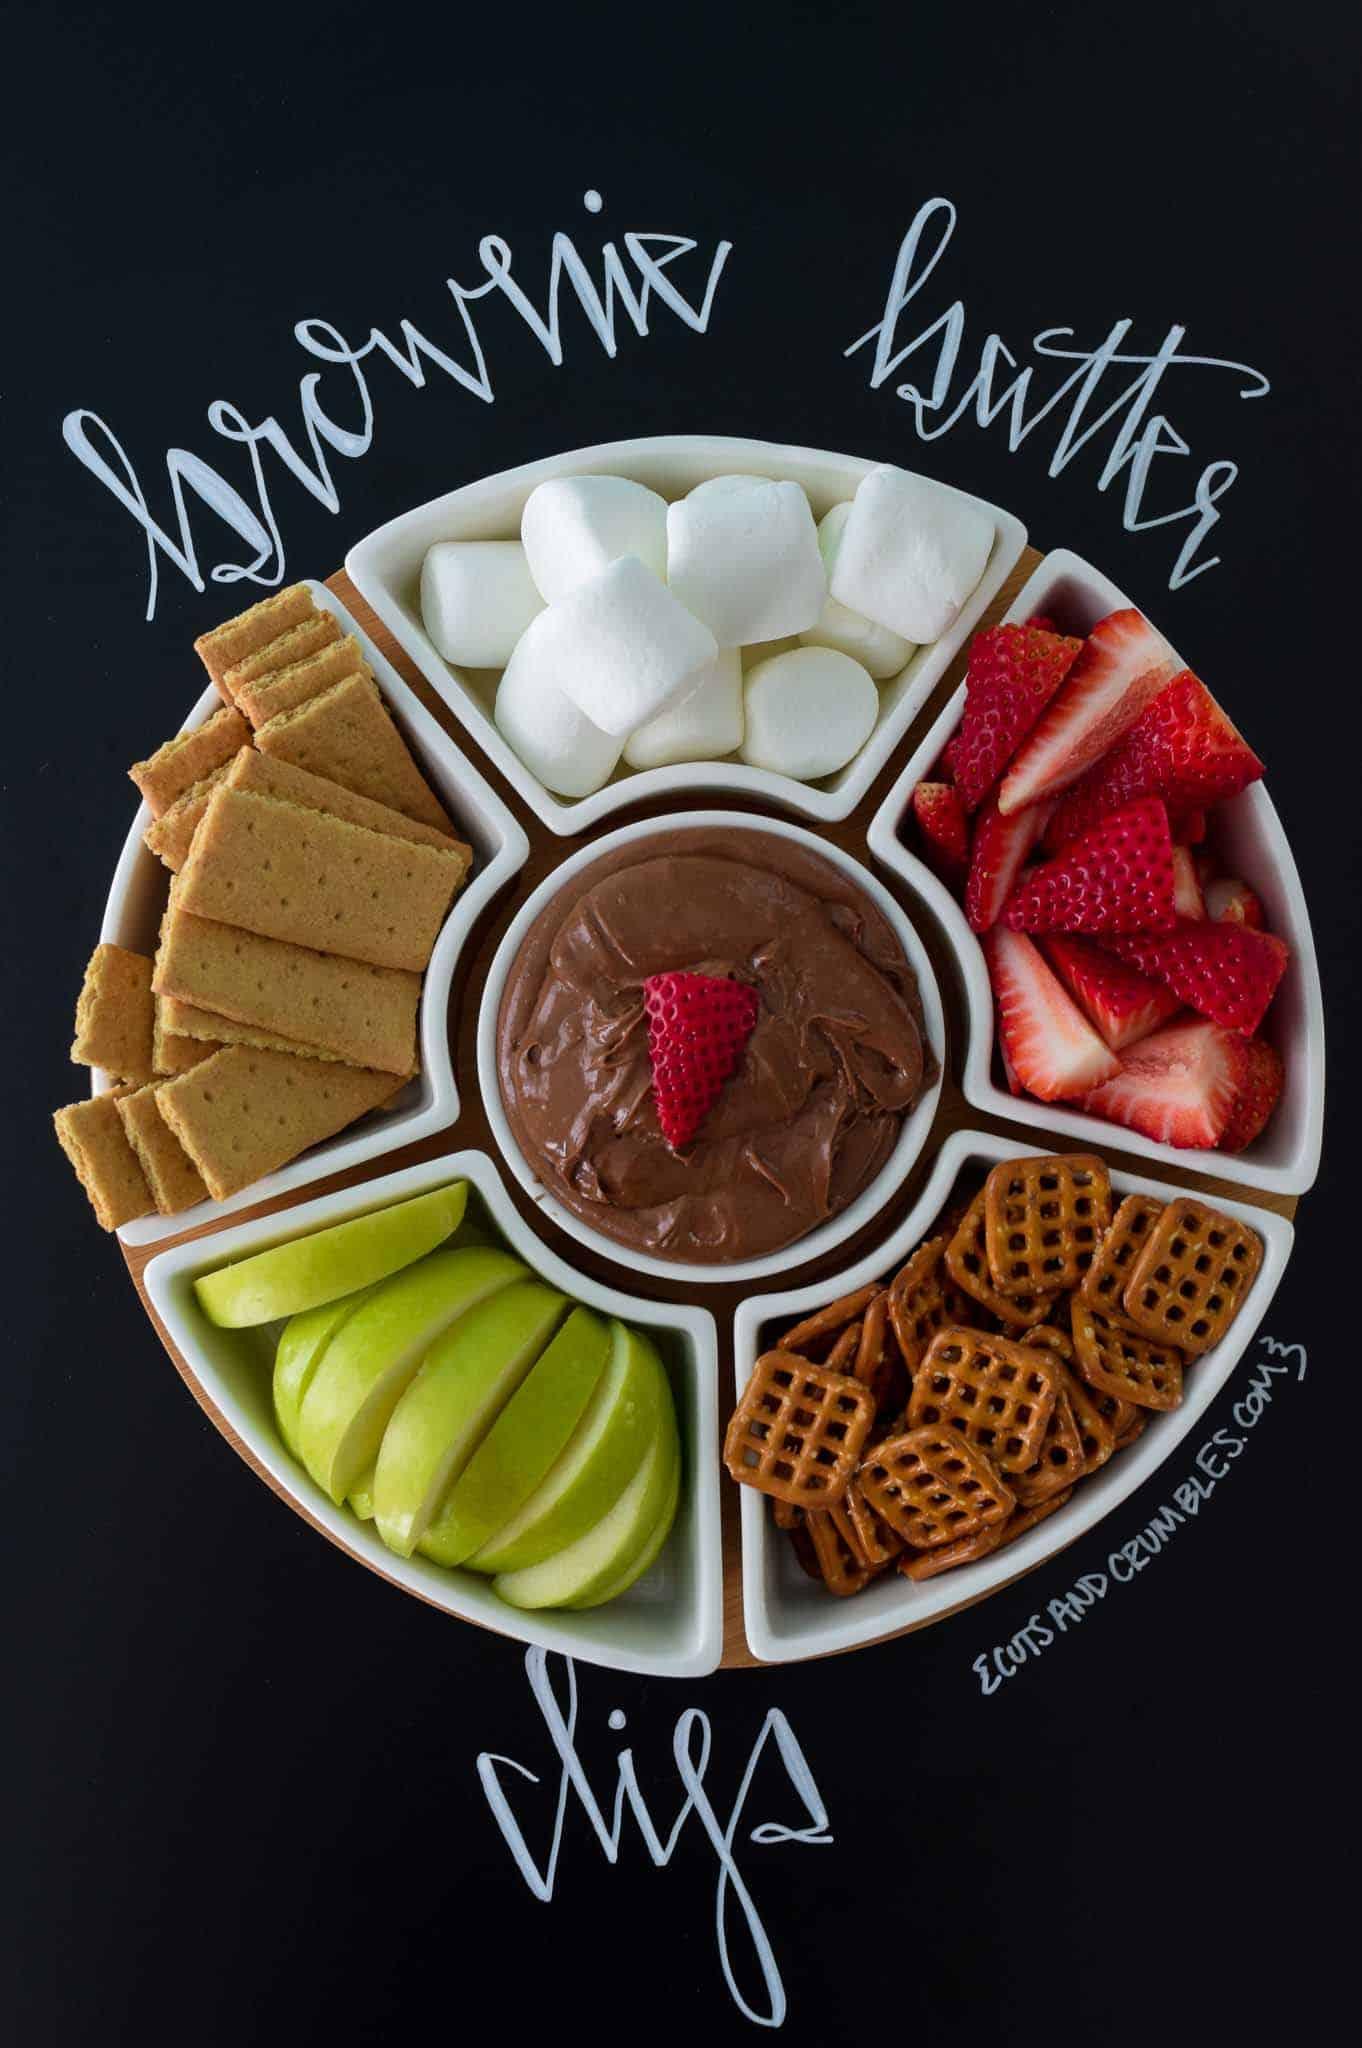 Brownie Batter Dip with title written on chalkboard